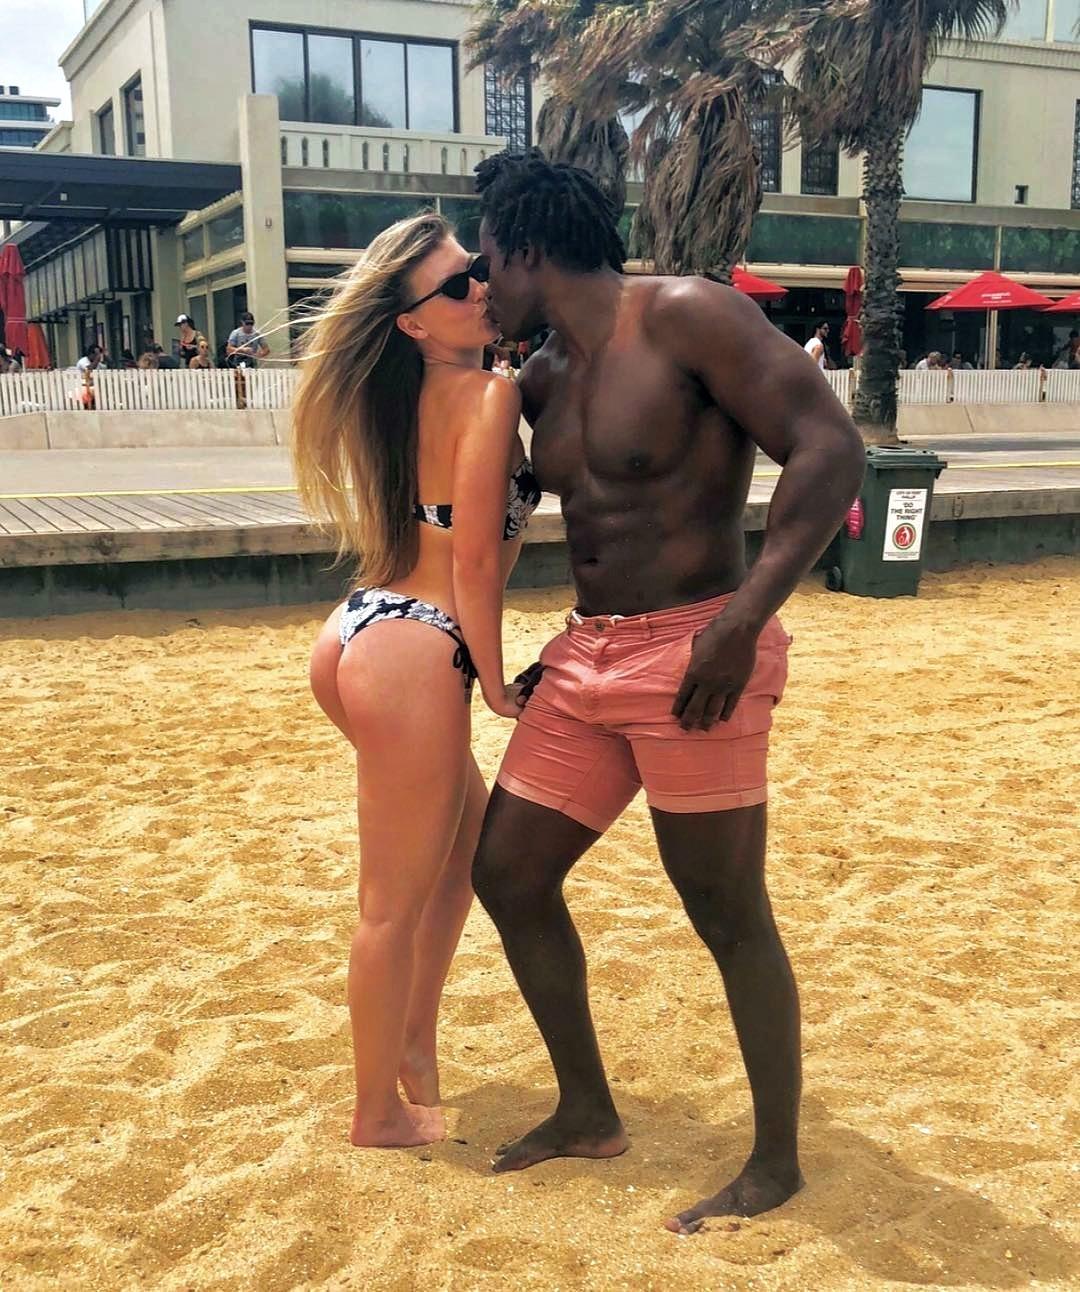 Black Men X White Women Hot Interracial Kiss 11 By Martianmanhunterdc On Deviantart